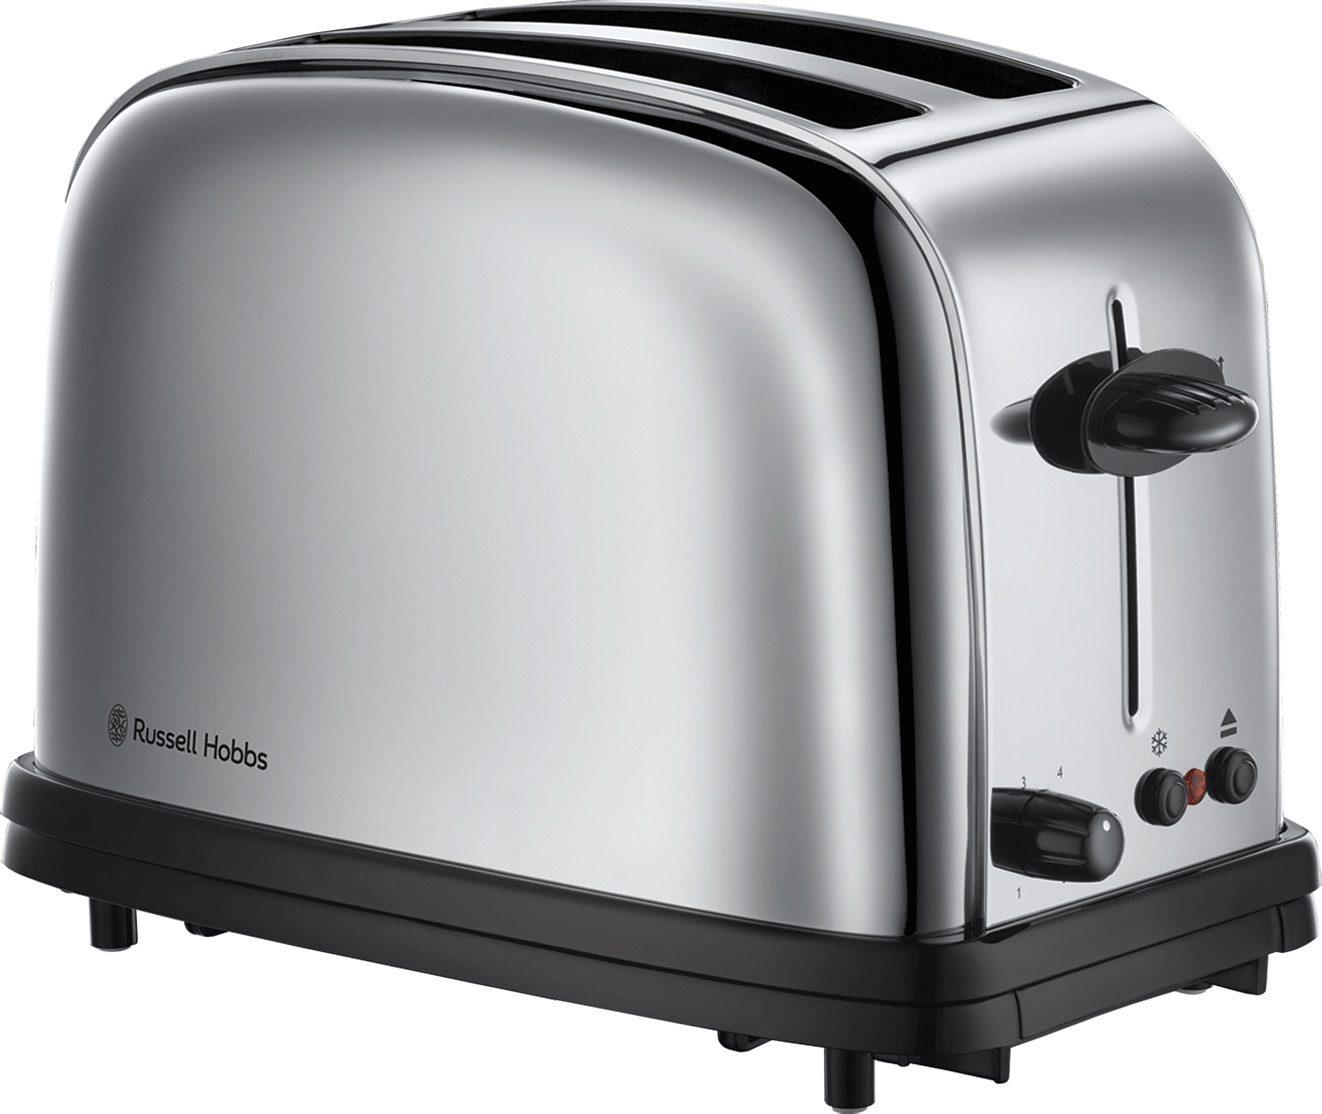 Russell Hobbs Toaster 20700-56 Oxford, 1200 Watt, schwarz/silber